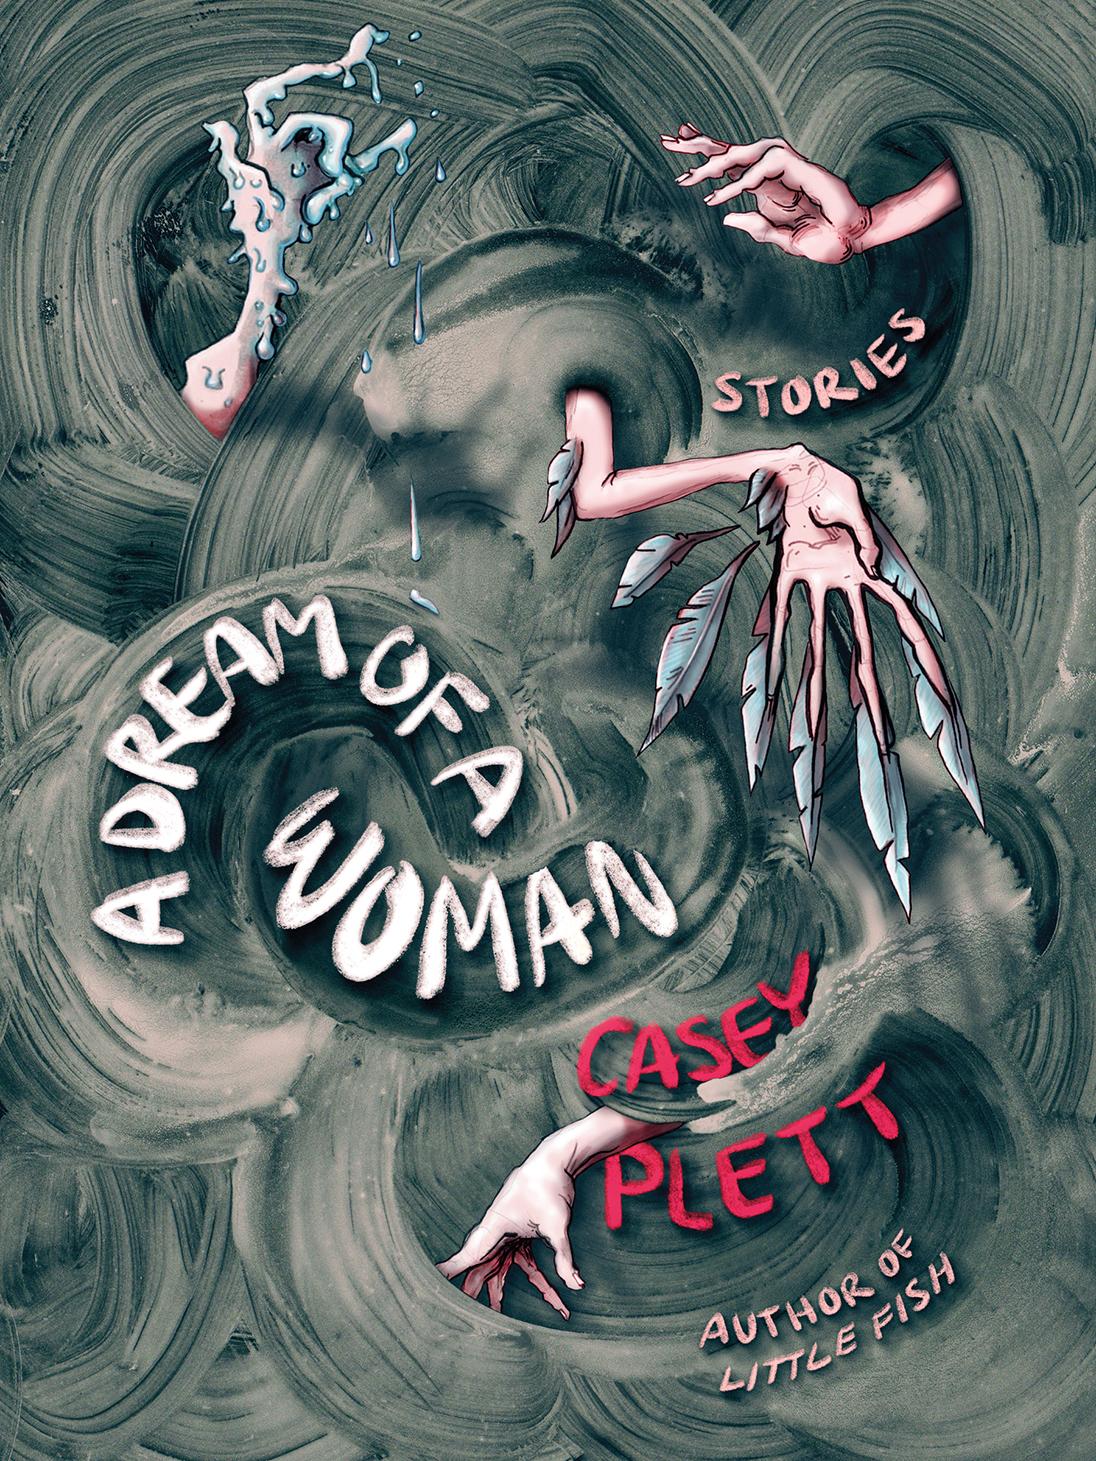 A Dream of a Woman by Casey Plett